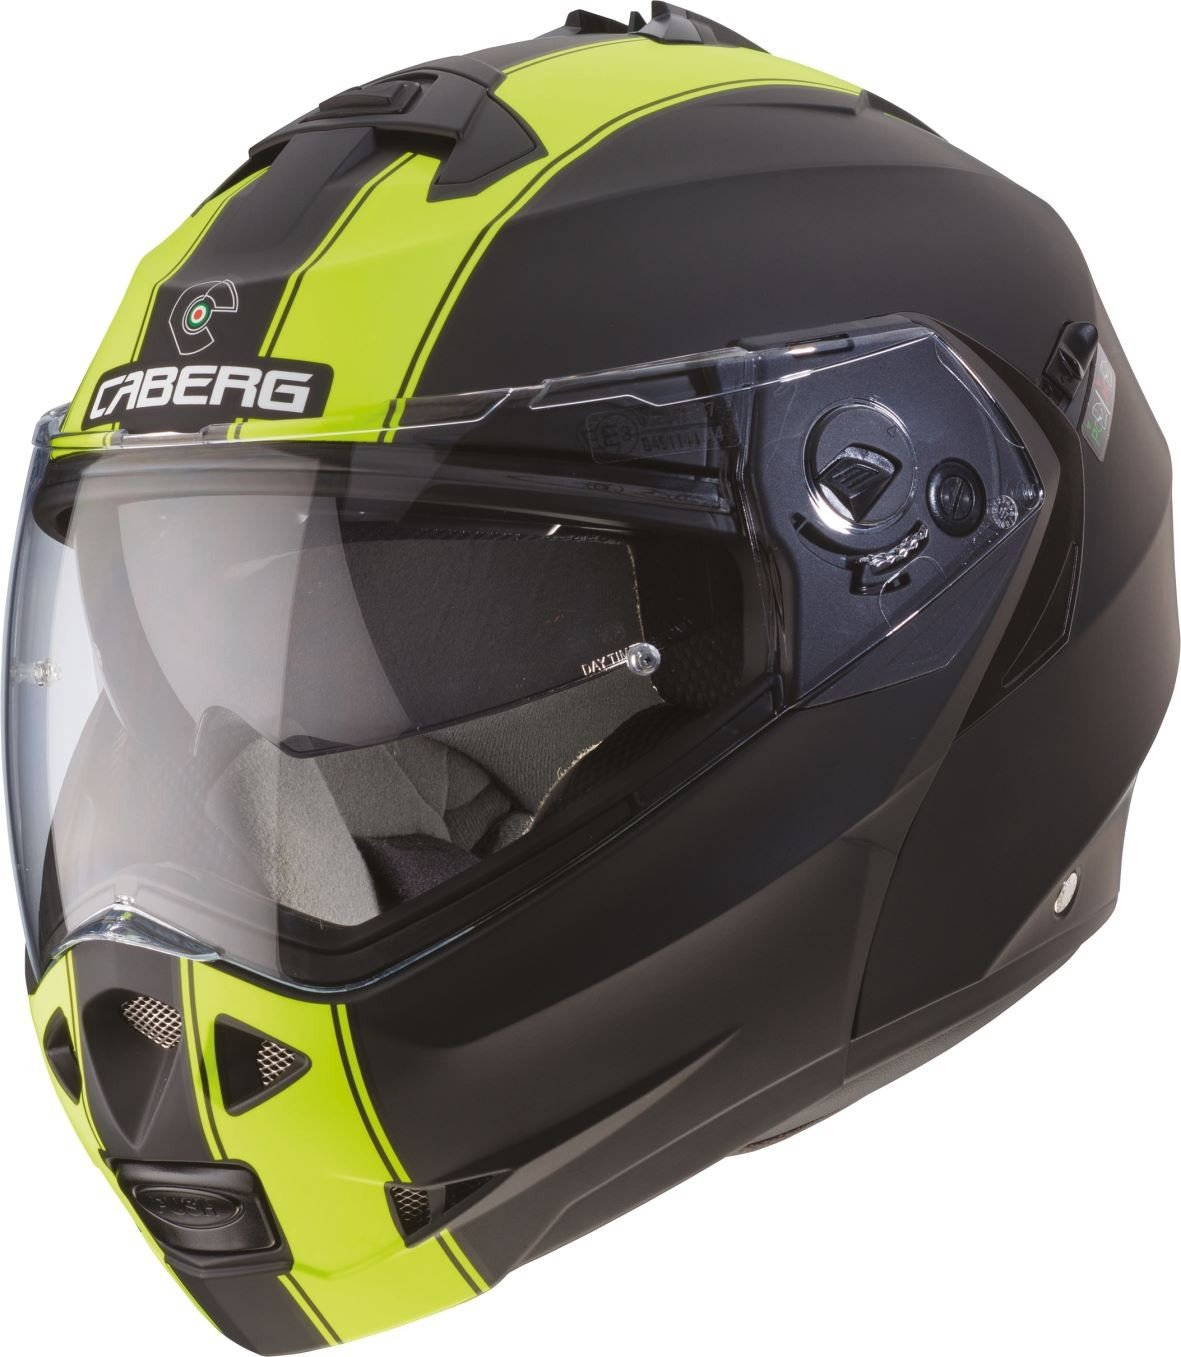 Caberg Klapp Helm Duke II 2 Motorrad Bel/üftet Sonnenblende Pinlock Visier Jet Brillentr/äger Gr/ö/ße S 308650 Farbe Gunmetal